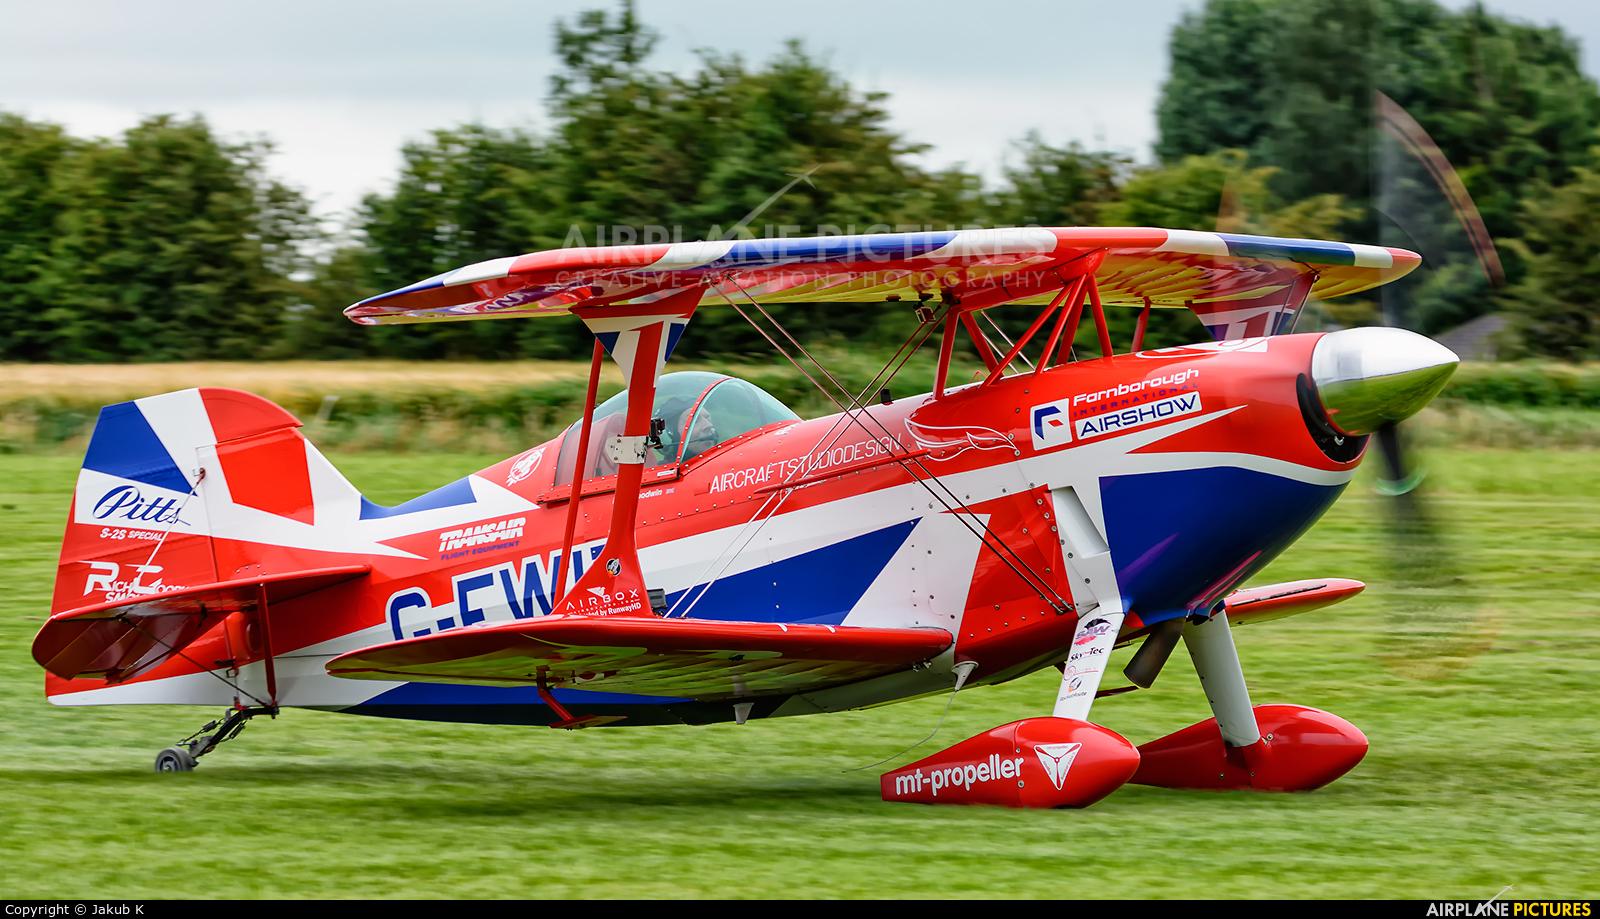 Rich Goodwin Airshows G-EWIZ aircraft at Birr